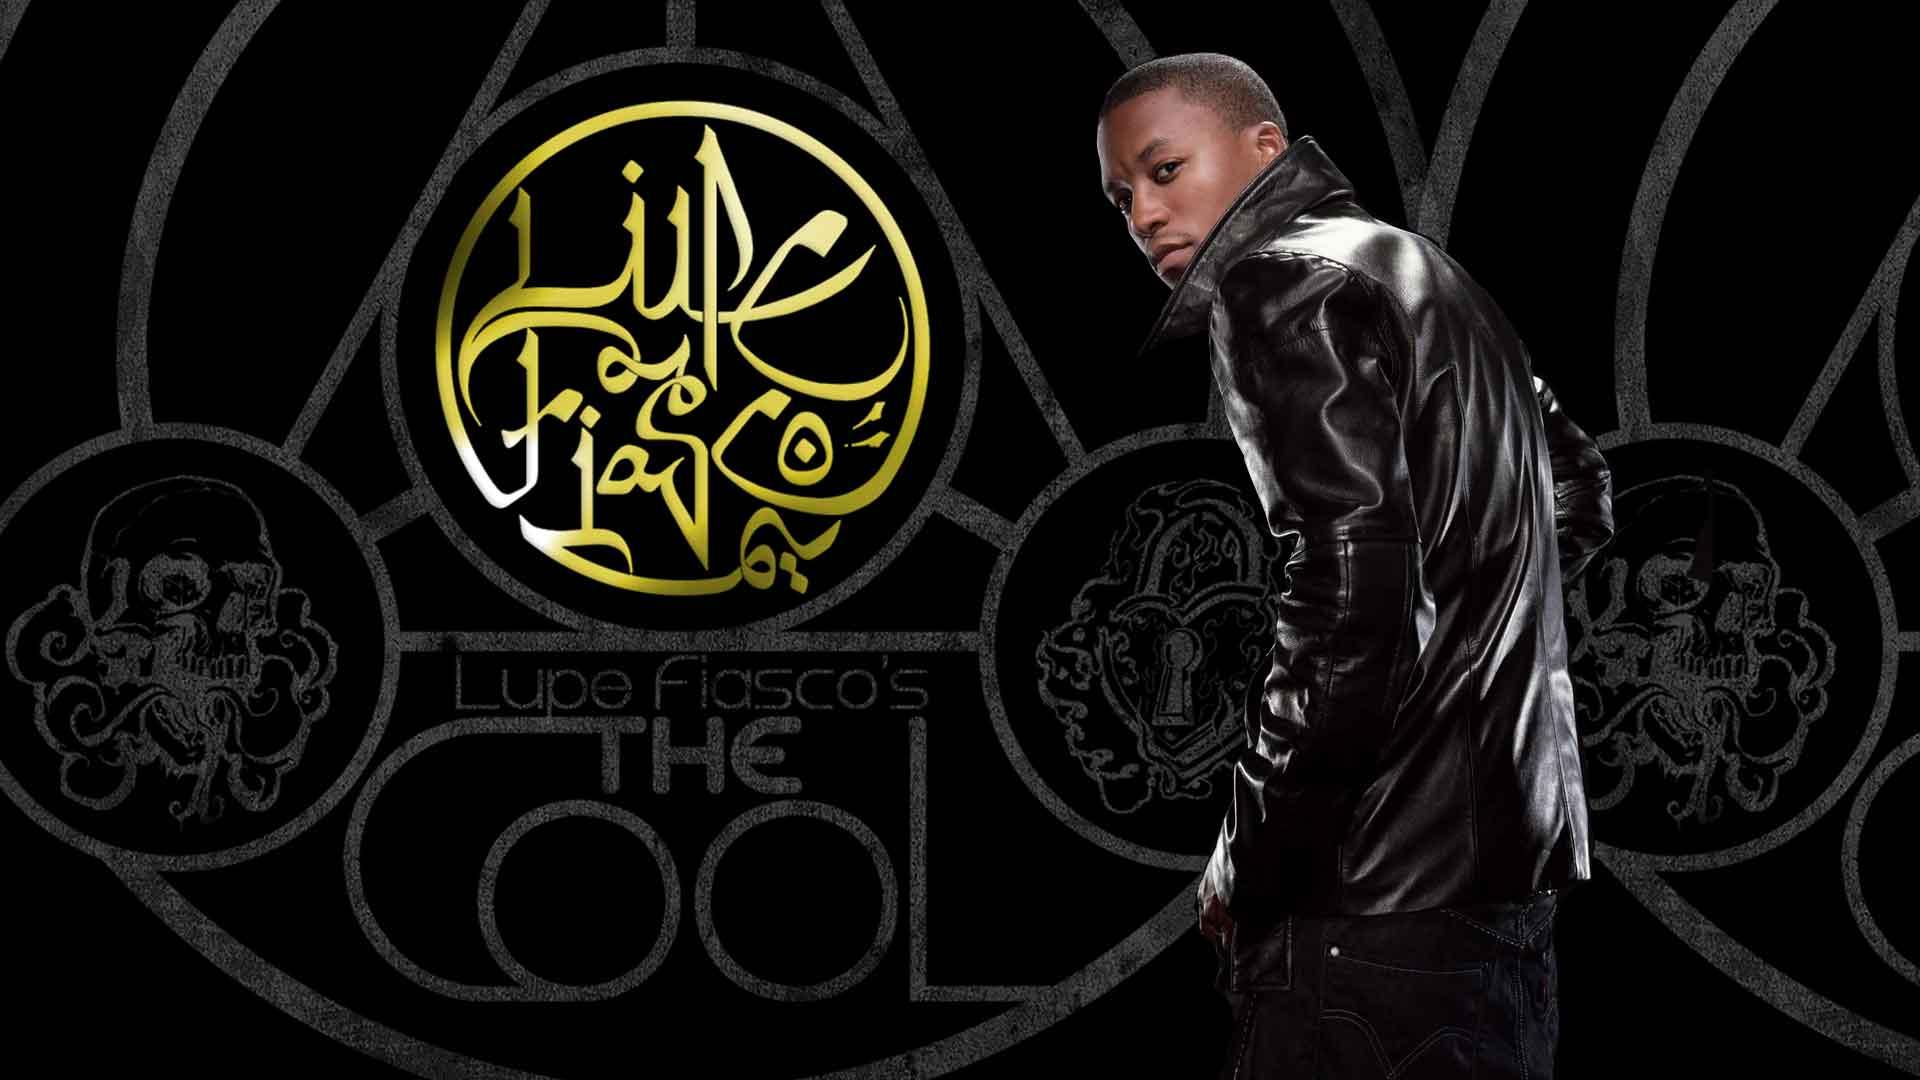 Lupe Fiasco - The Cool (2007)